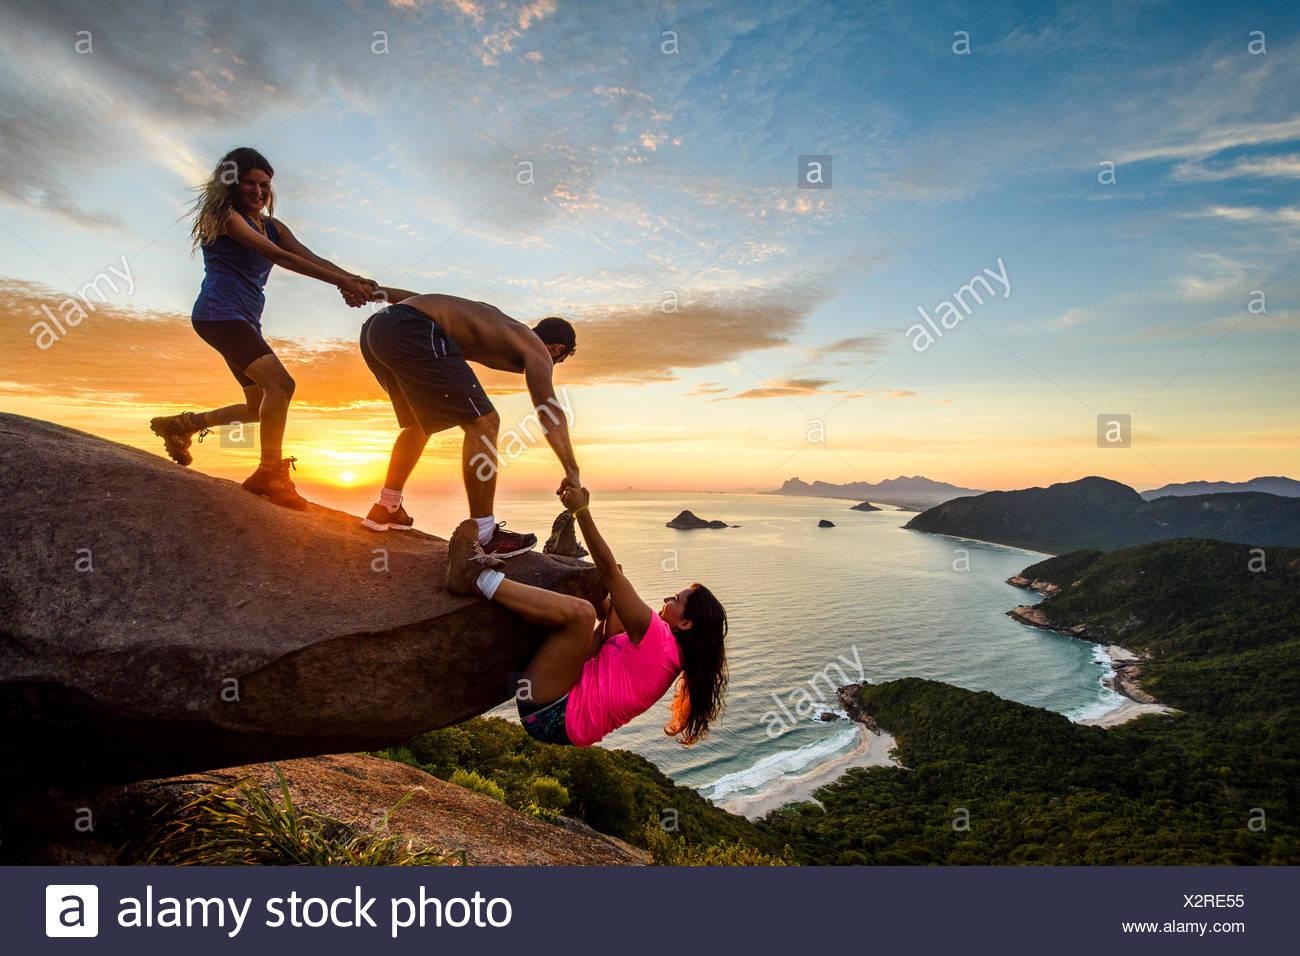 Dos personas que ayudaban a la mujer rock subir al atardecer, Pedra do telégrafo, Río de Janeiro, Brasil Imagen De Stock